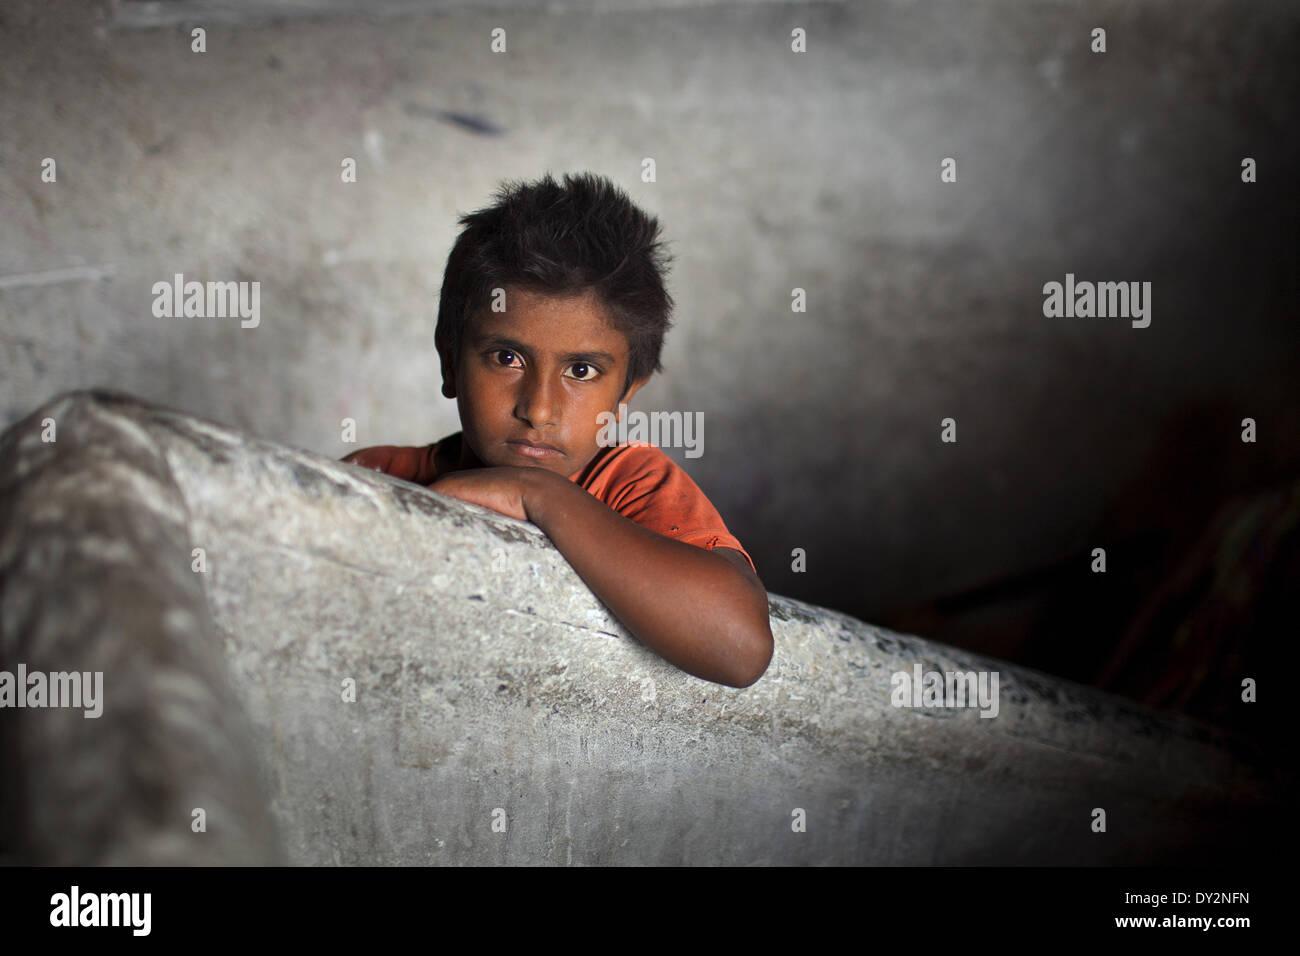 Dhaka, Bangladesh. 4th Apr, 2014. SHOHAG works at a manual soap factory in Dhaka, Bangladesh. Child labour is not - Stock Image